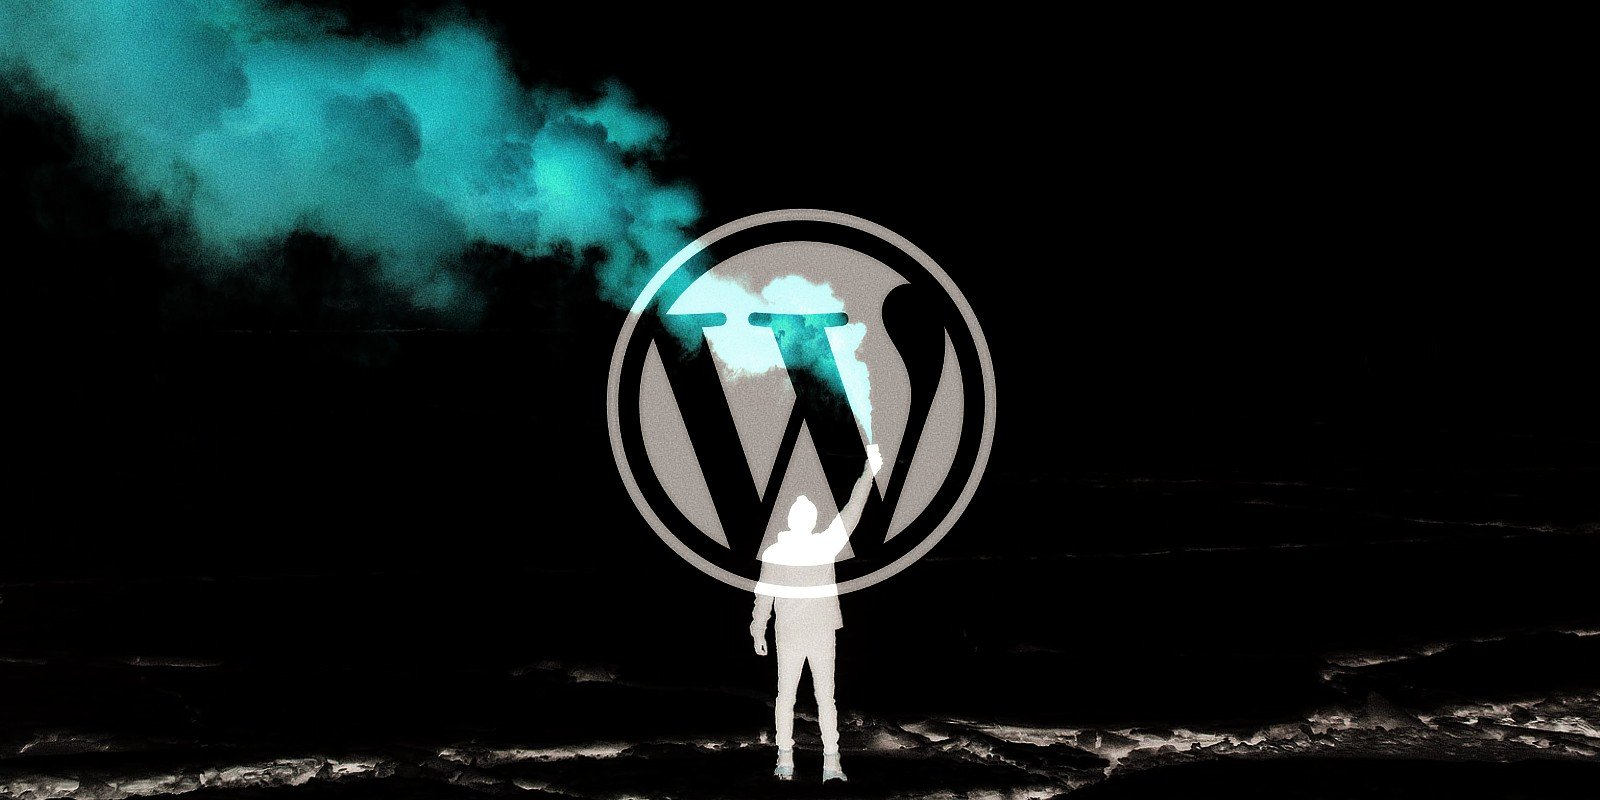 WordPress se plantea deshabilitar Google FLoC en sitios web [ENG]